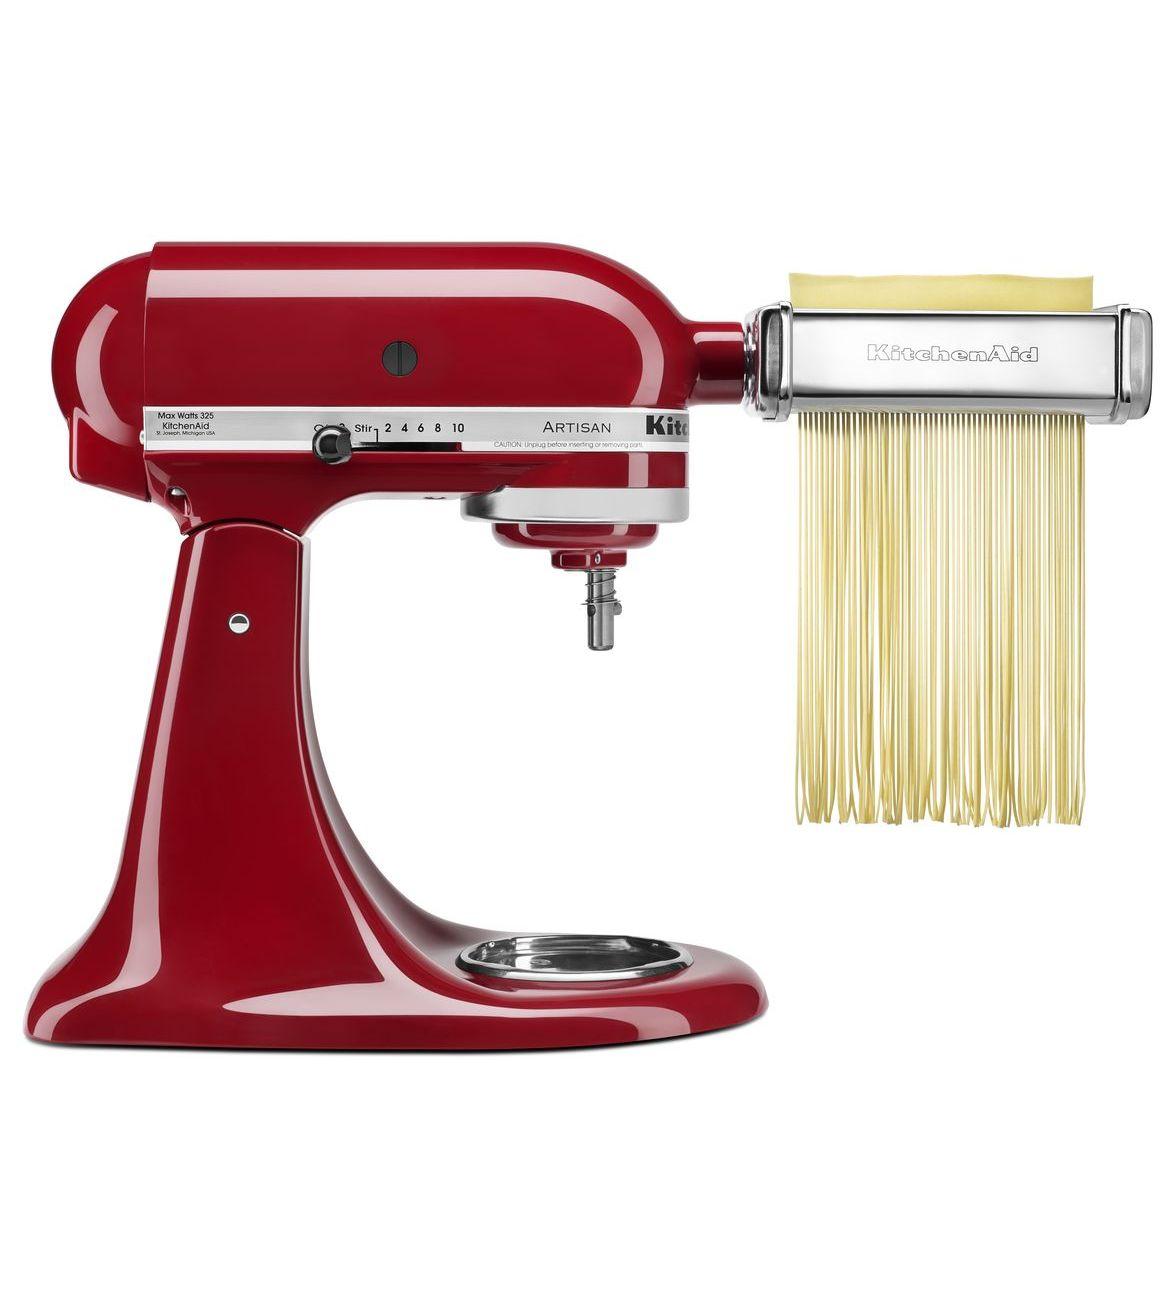 Kitchenaid how much is the kitchenaid pasta attachment for Kitchenaid attachments